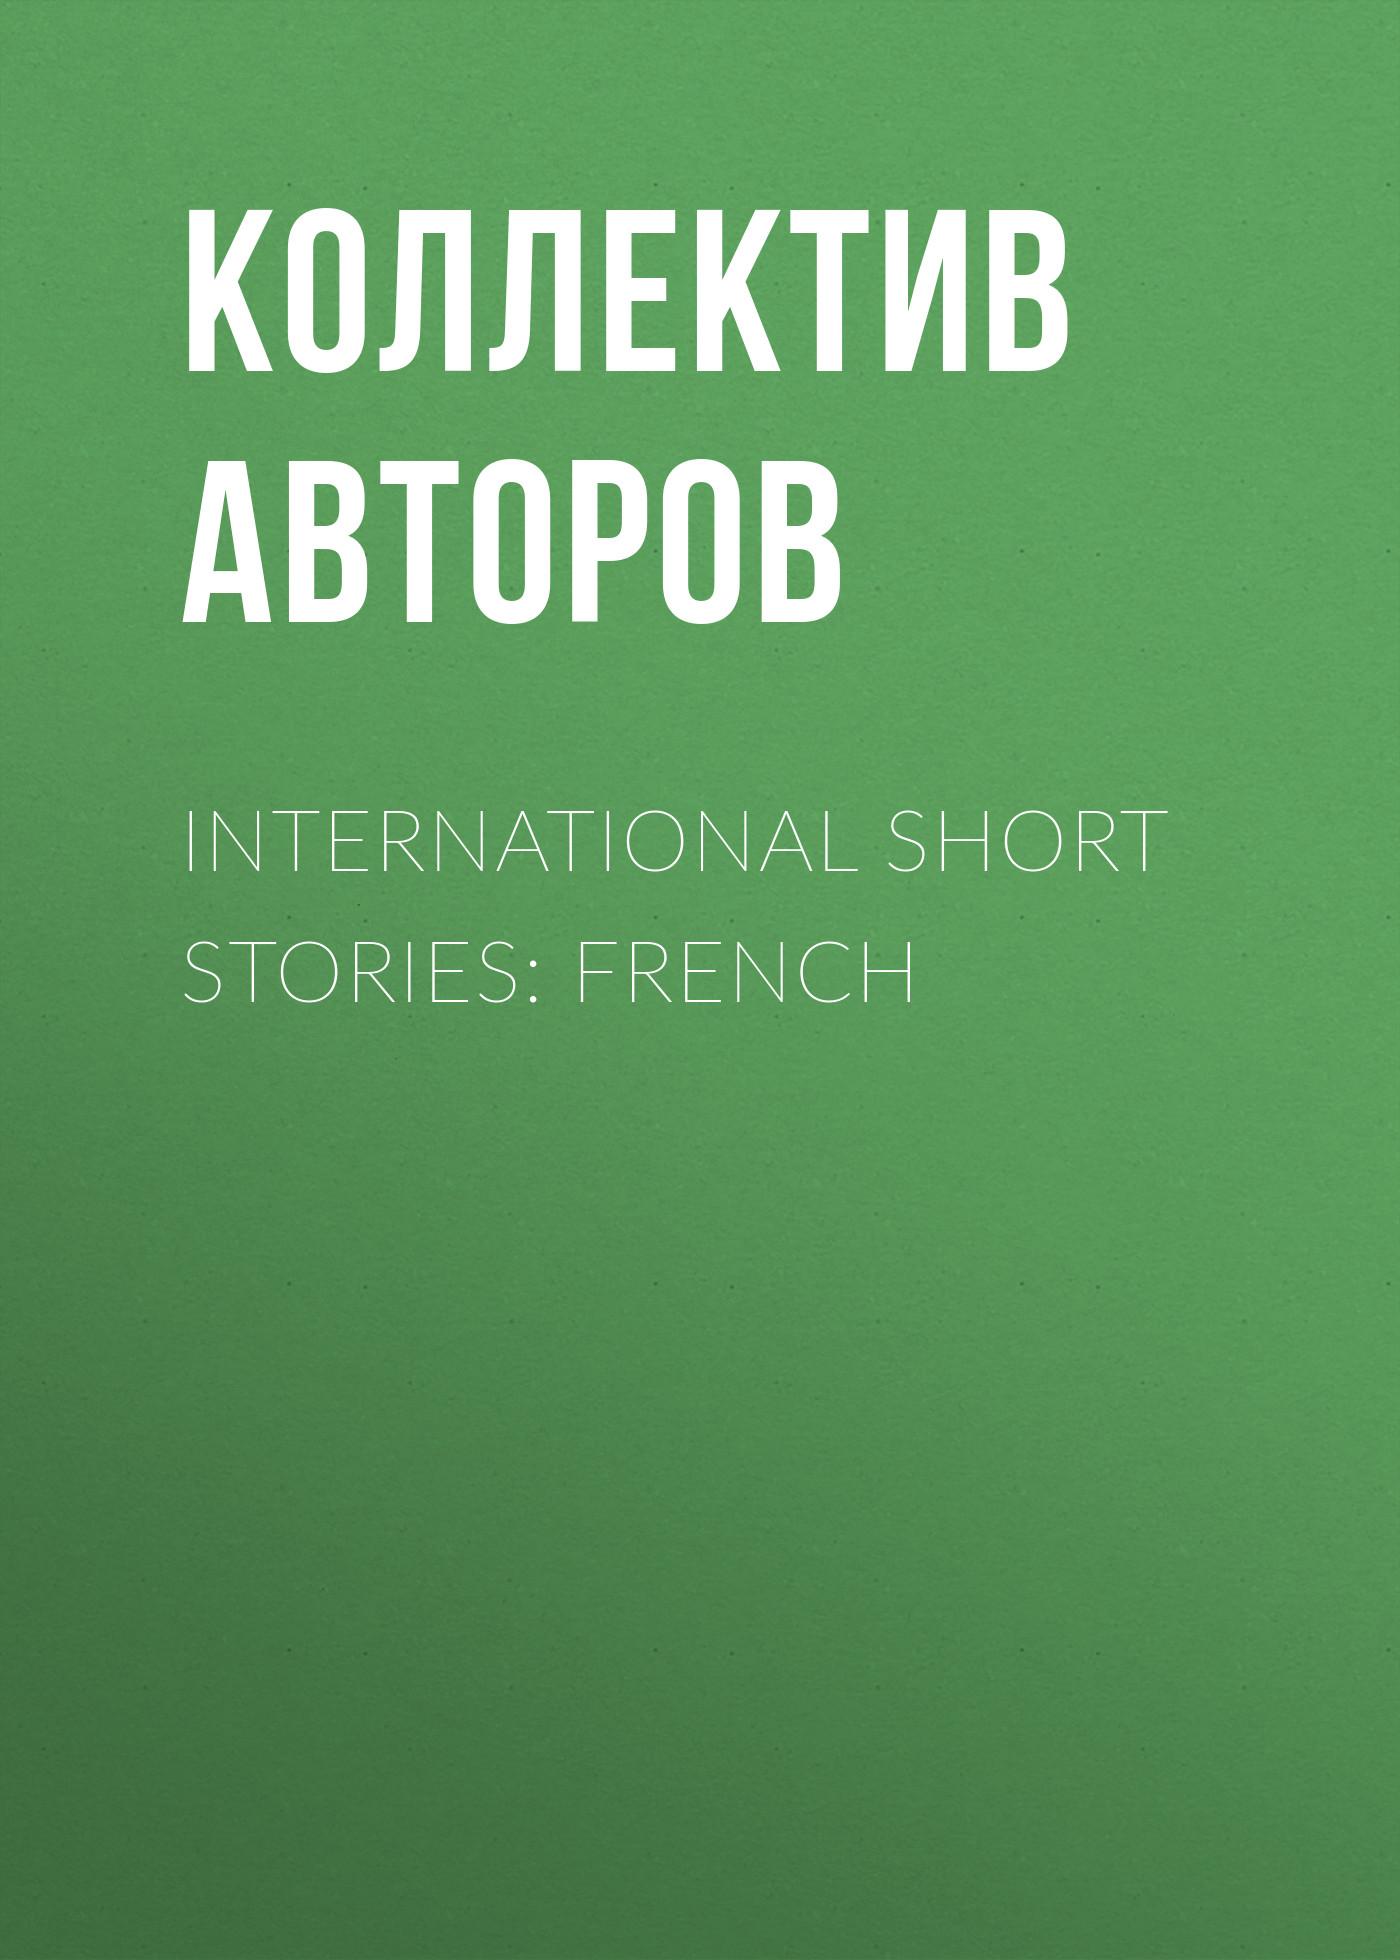 Коллектив авторов International Short Stories: French vitaly mushkin erotic stories top ten